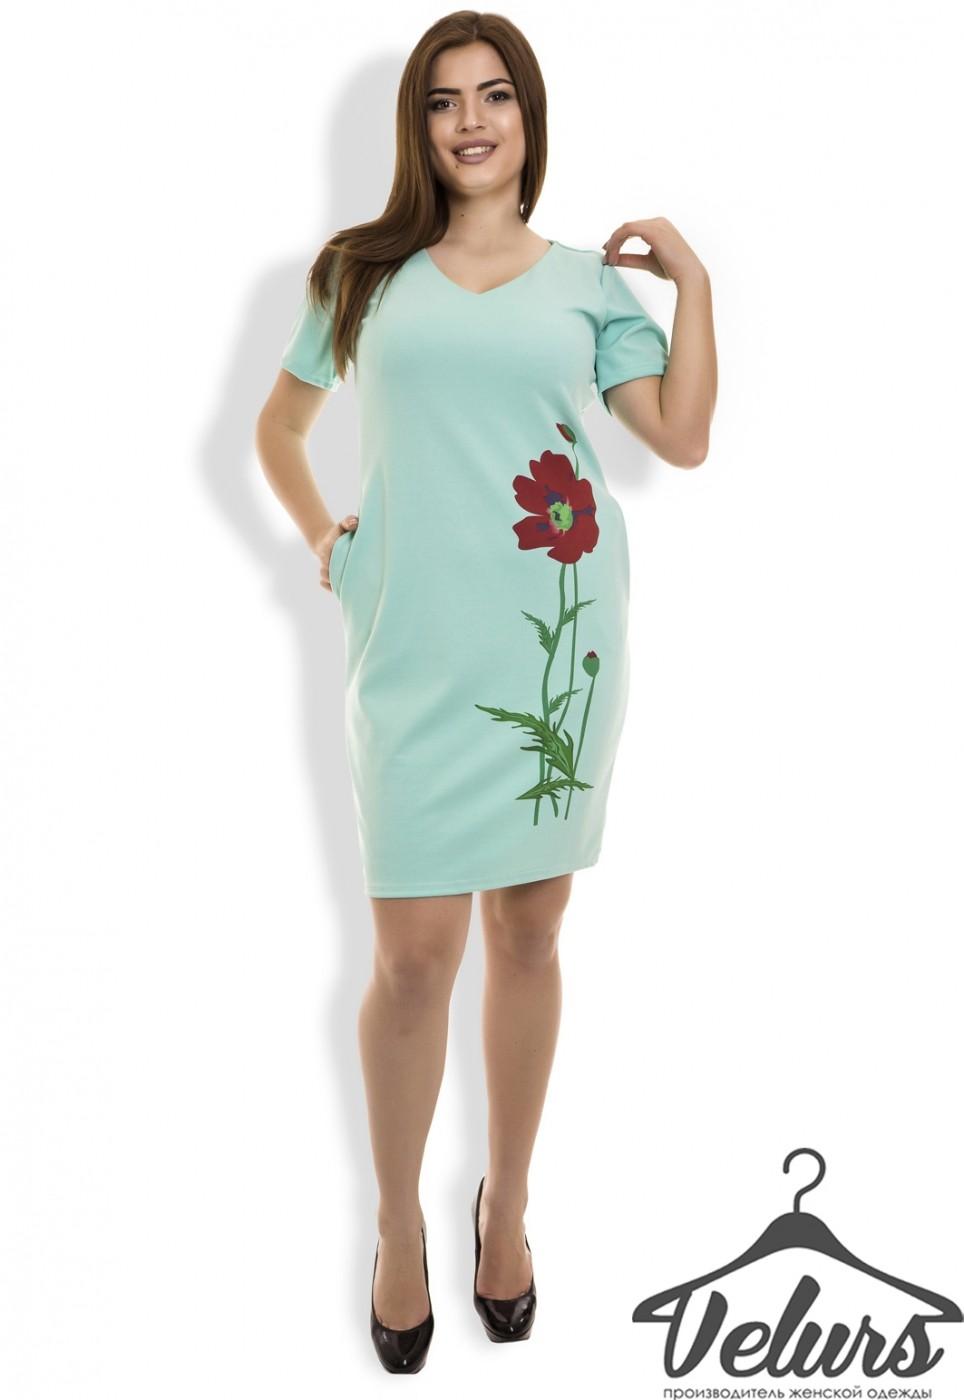 Velurs: Платье 212066 - фото 7